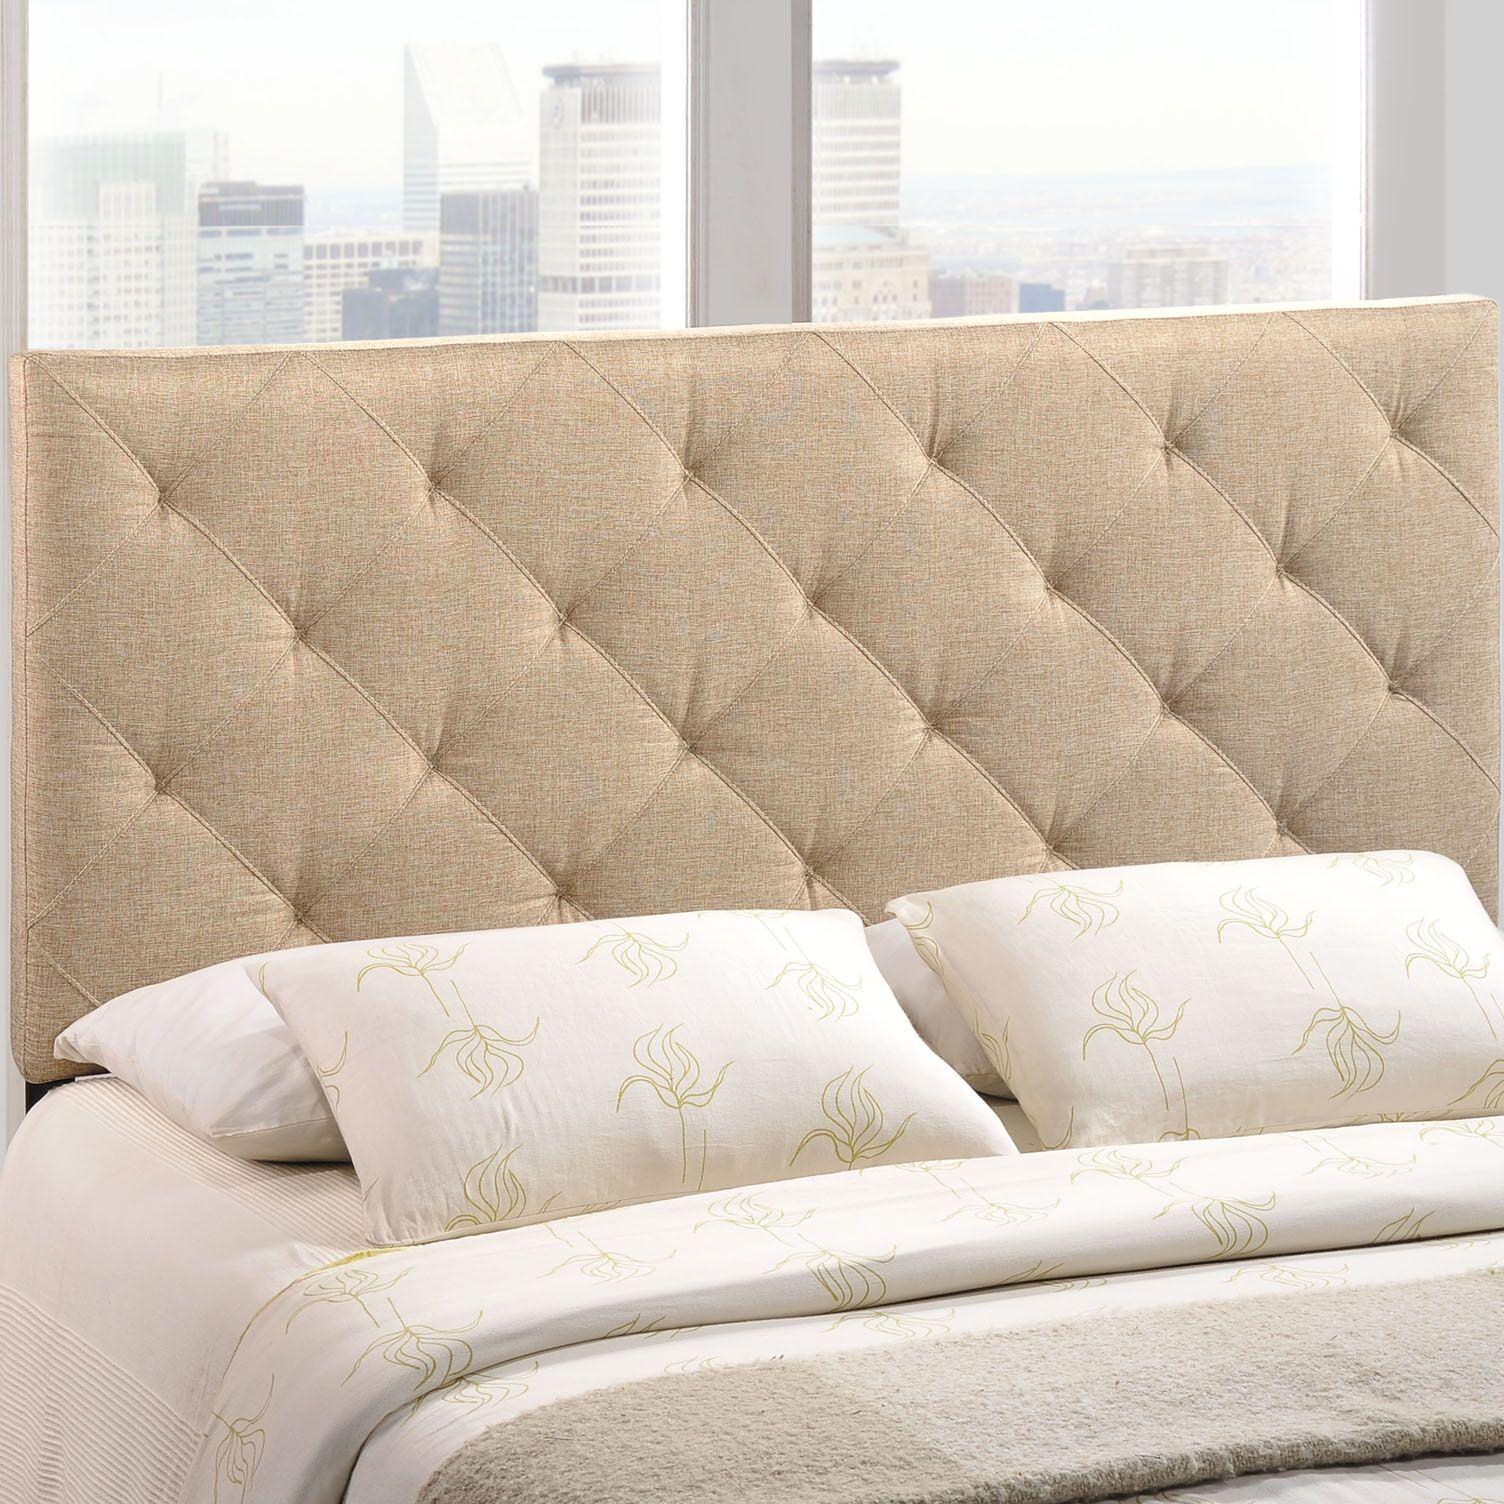 Theodore Upholstered Panel Headboard Upholstery: Beige, Size: Full